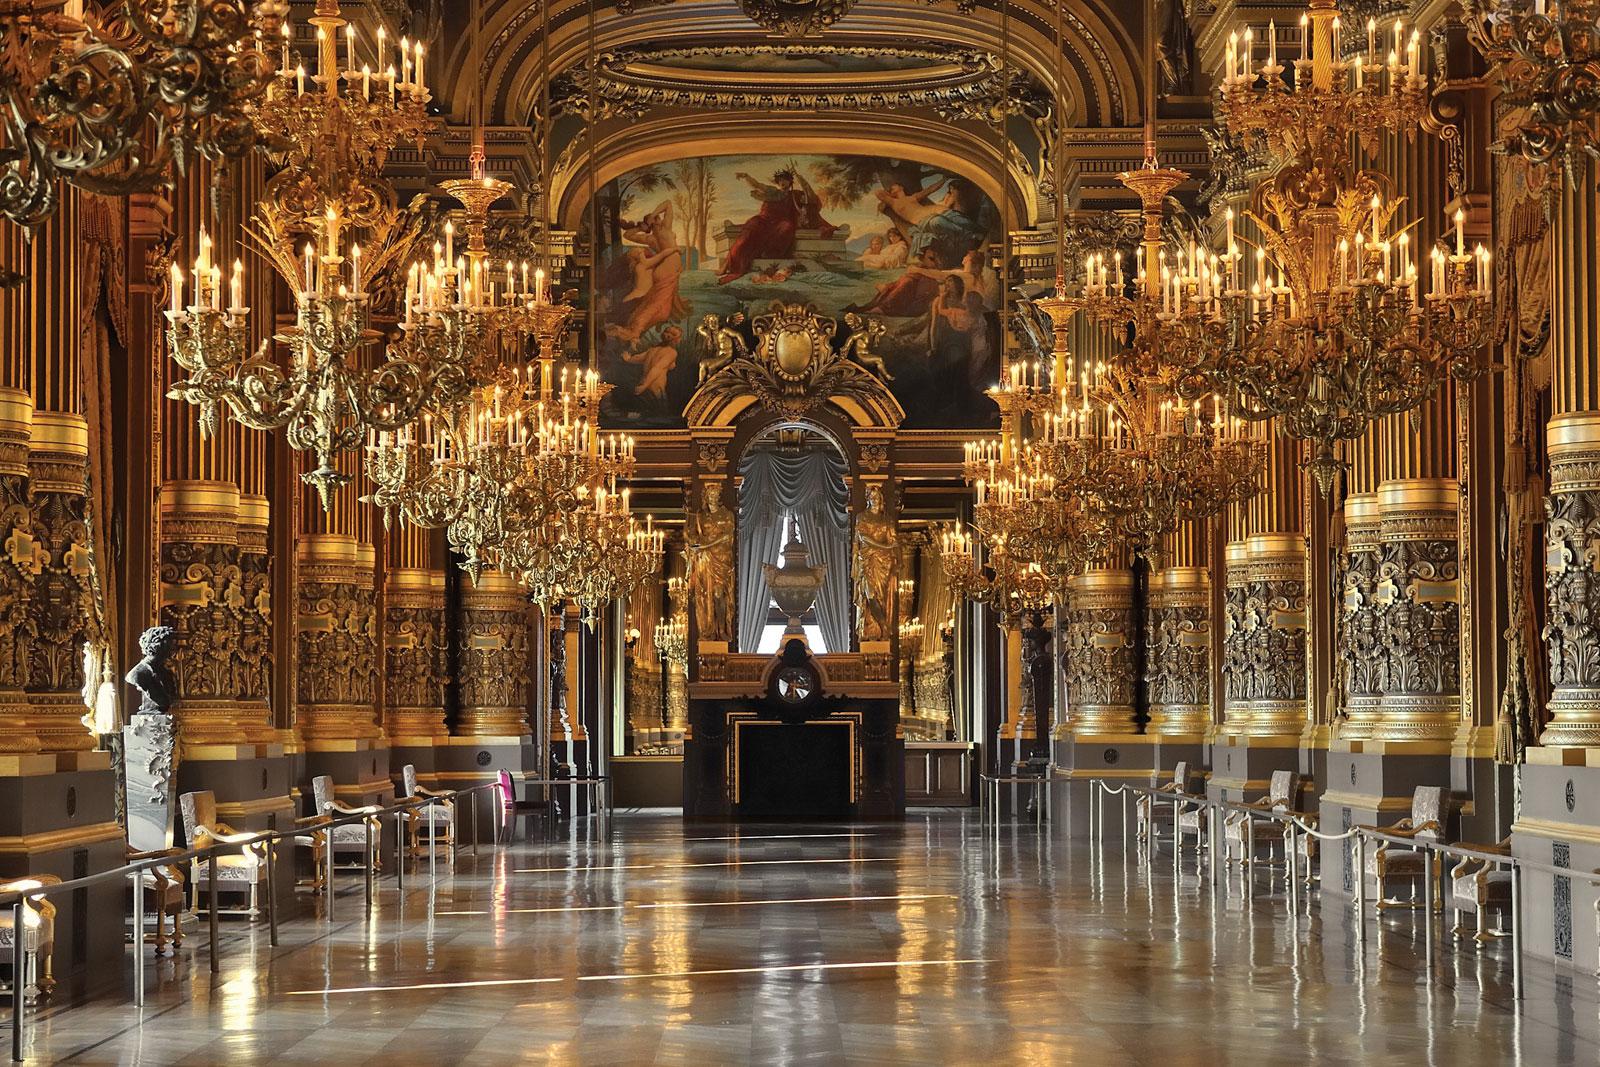 Virus latest: France bans 1000+ events. Opéra responds